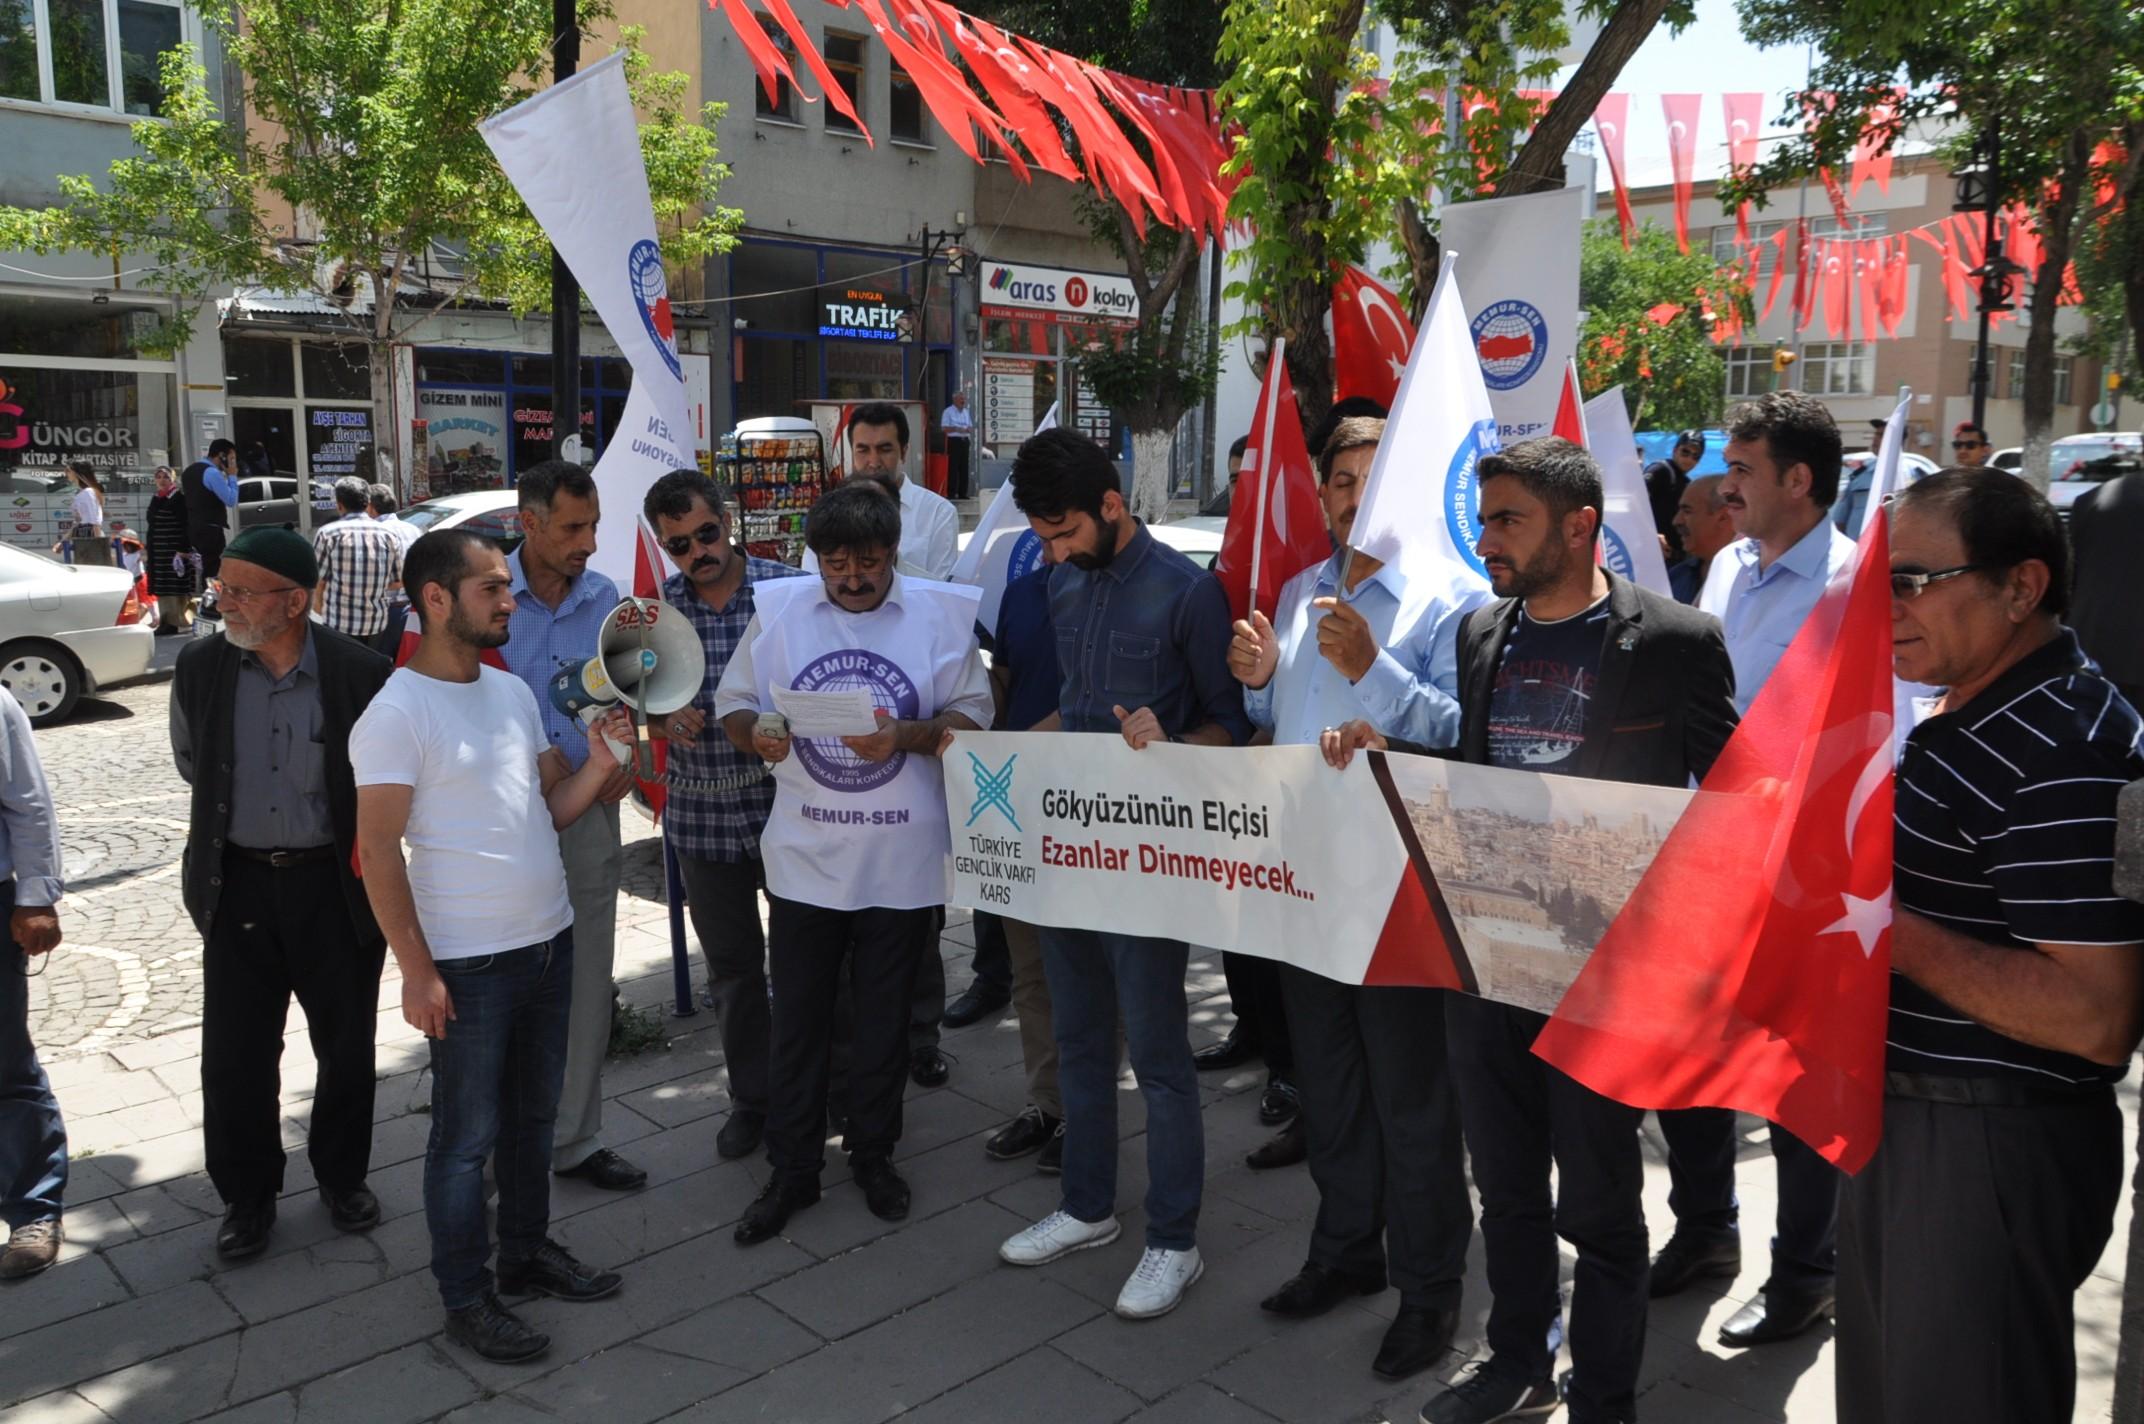 memur-sen-israili-protesto-etti-(3).jpg